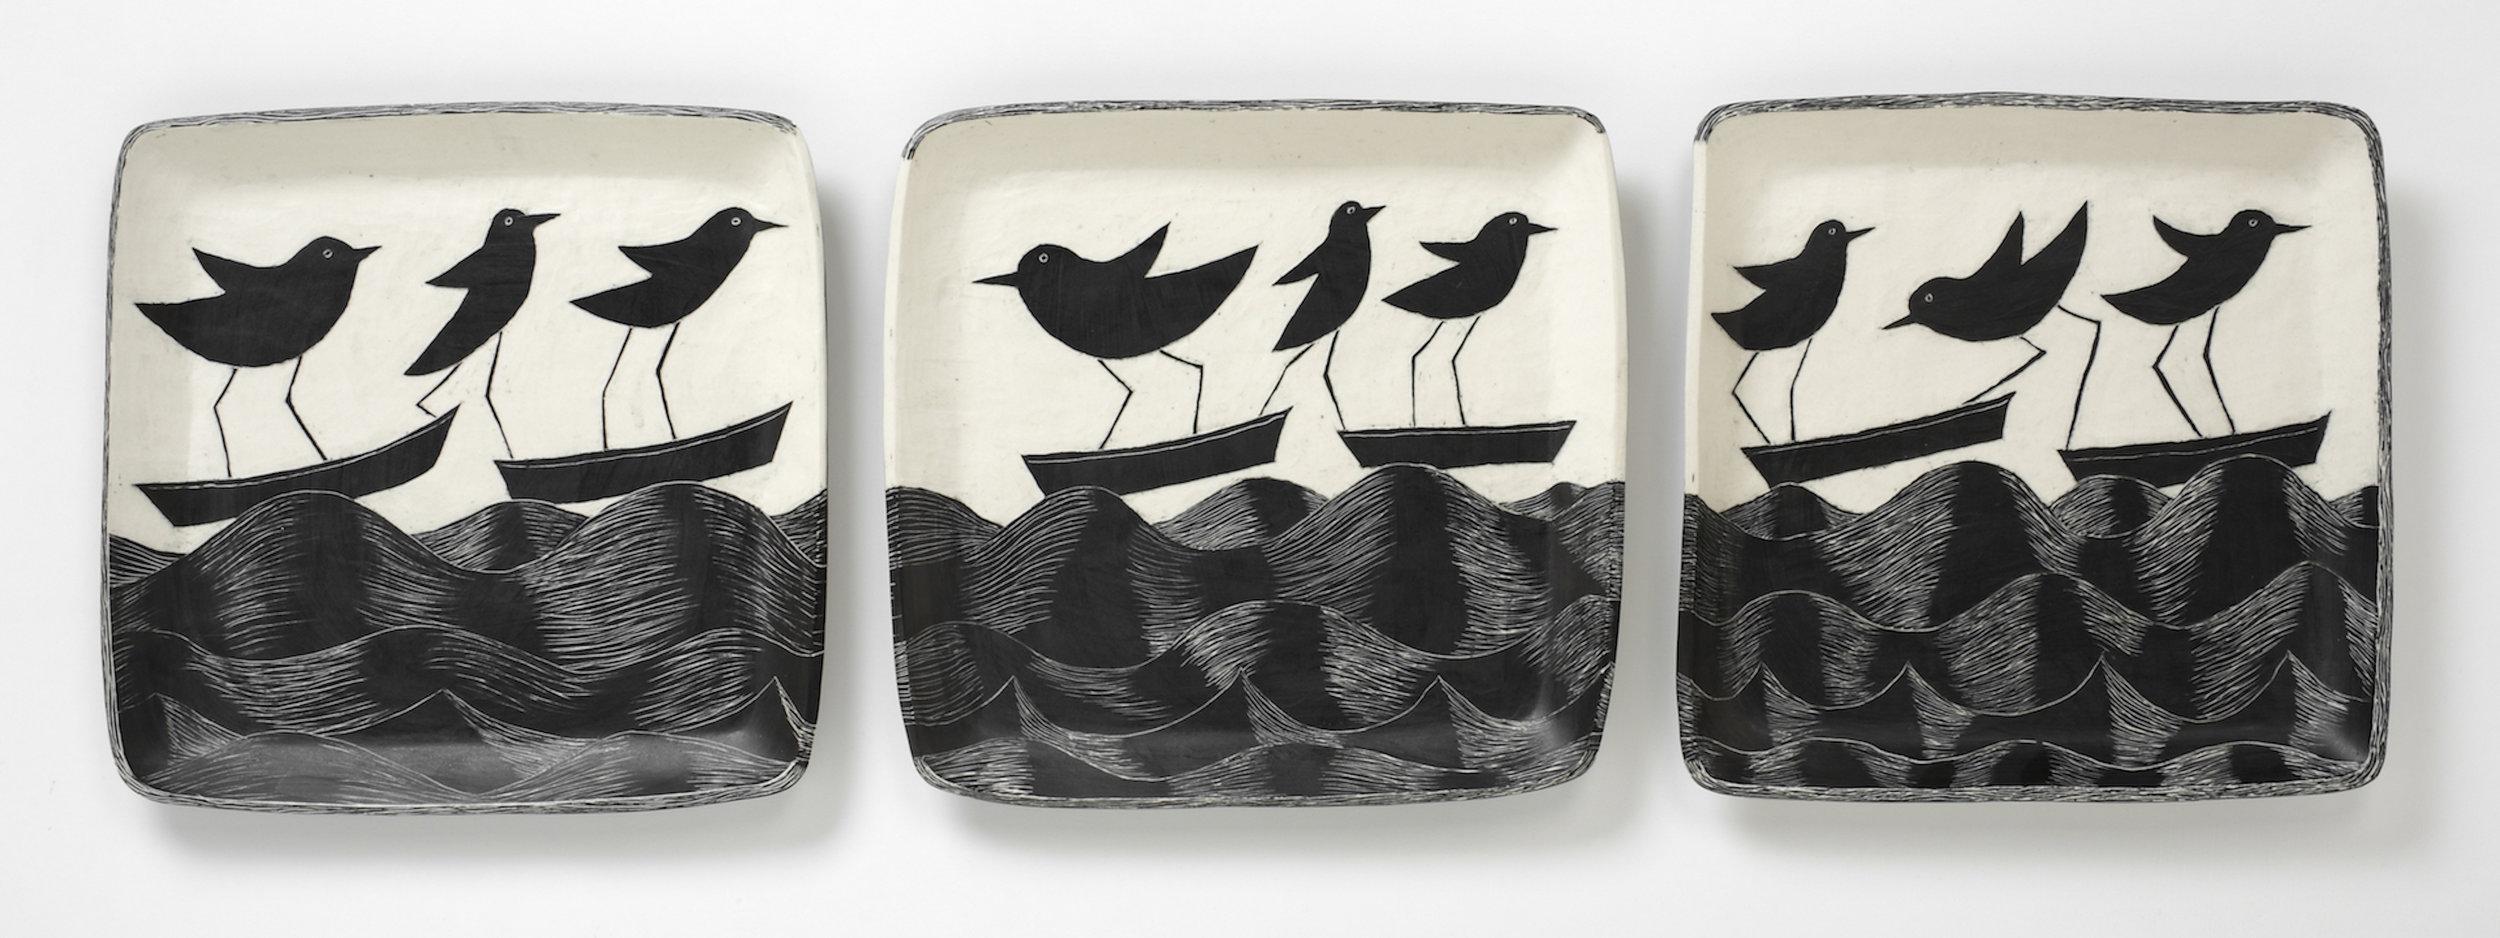 Land Birds at Sea, Triptych 2017